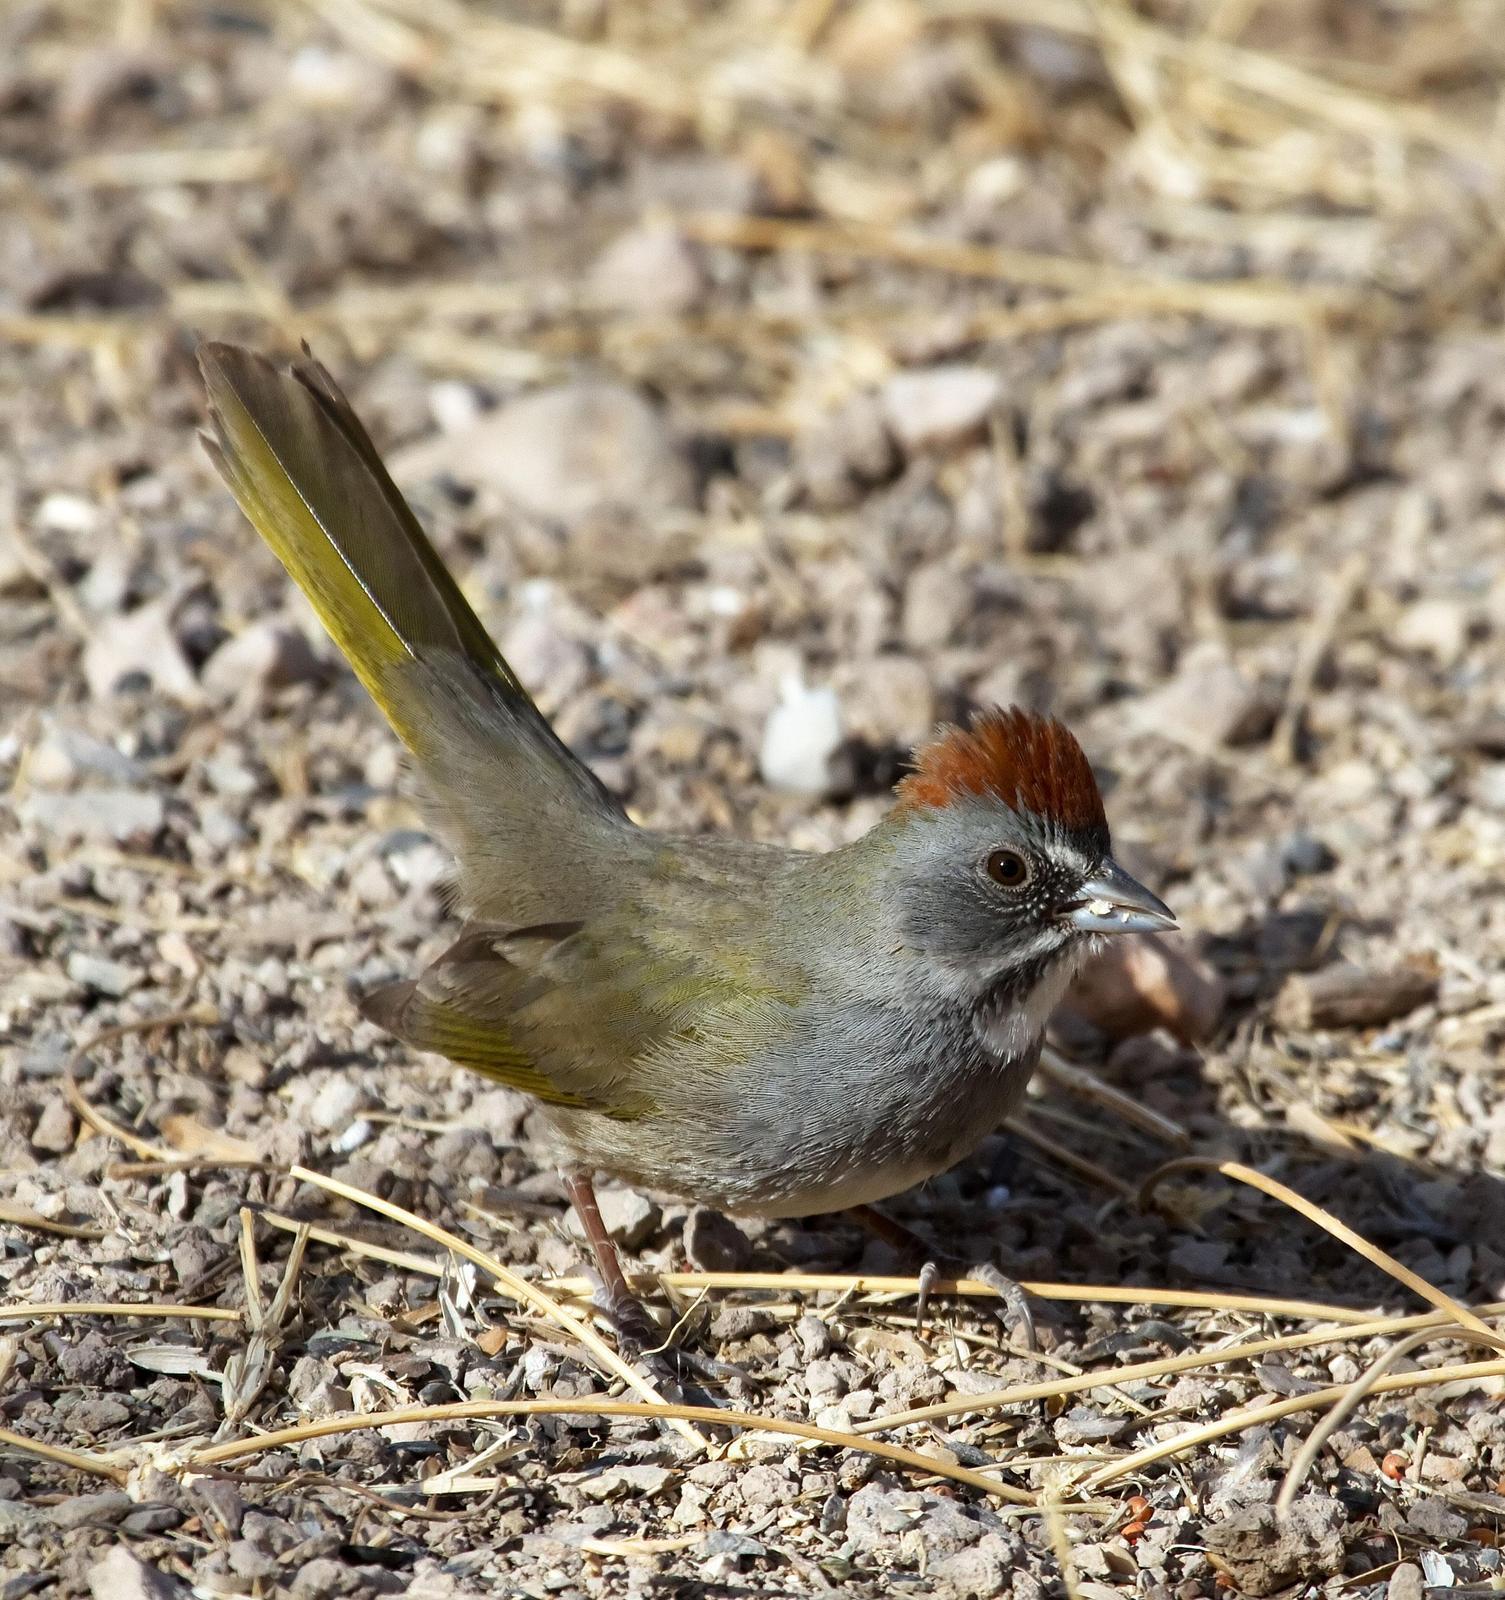 Green-tailed Towhee Photo by Scott Berglund